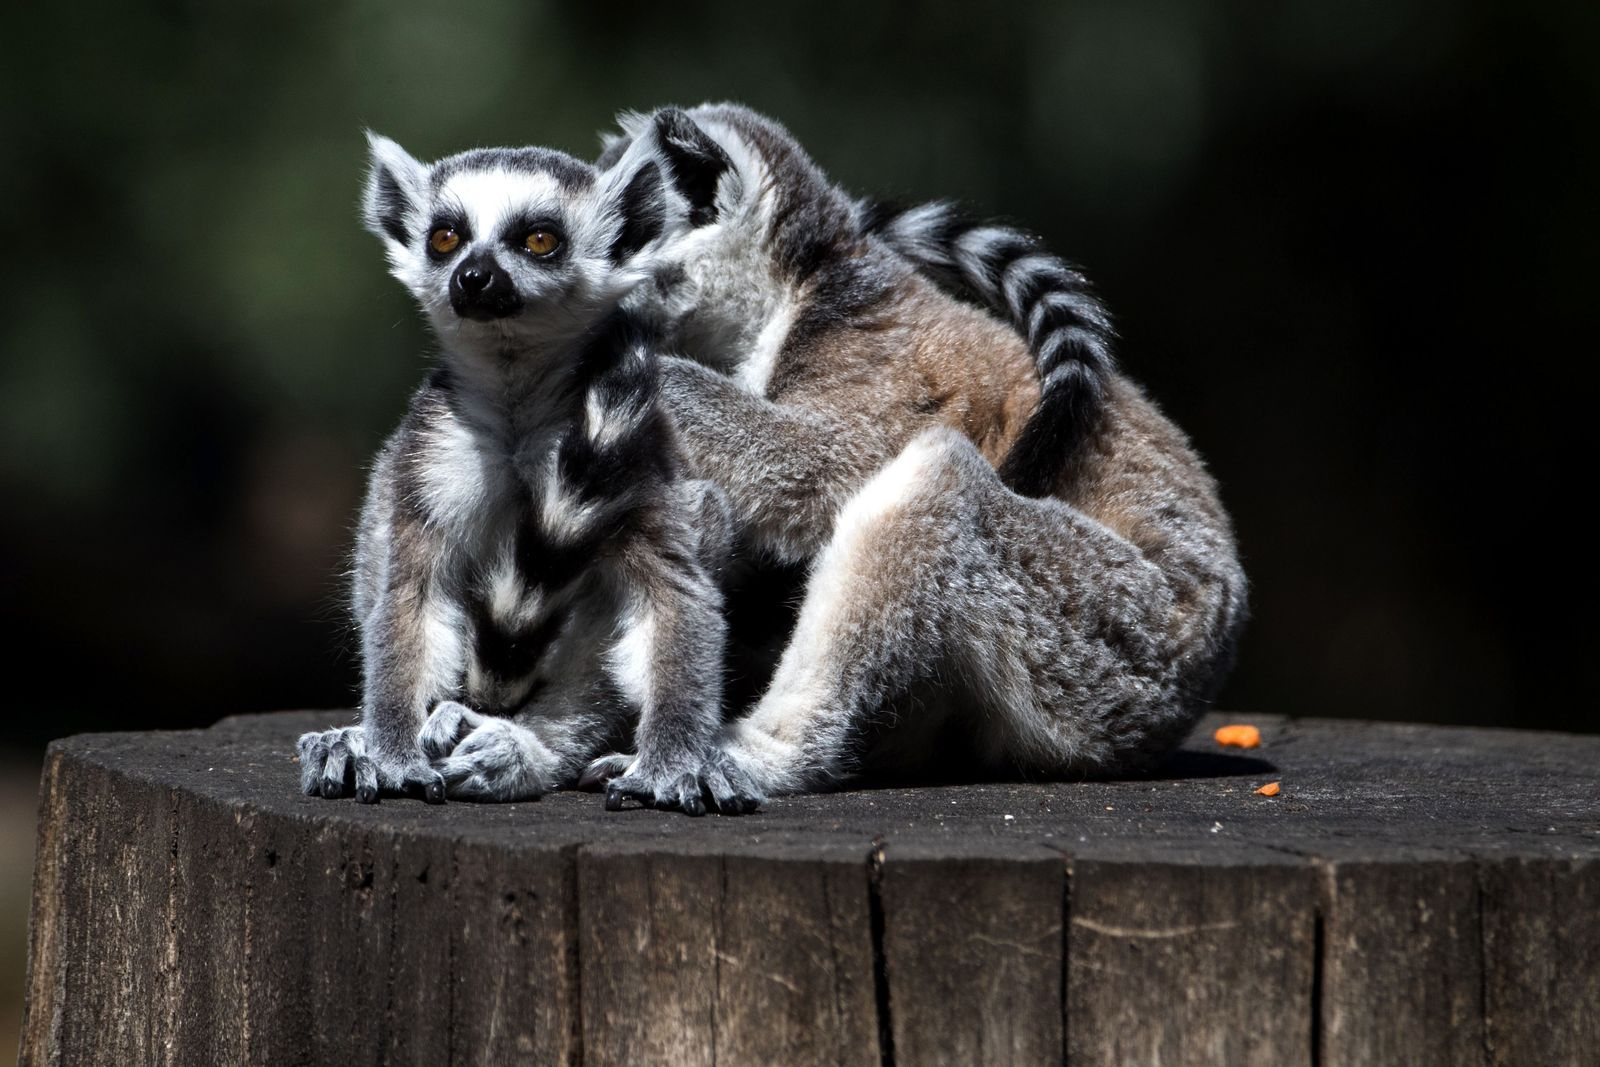 FRANCE-ANIMALS-ZOO-THOIRY